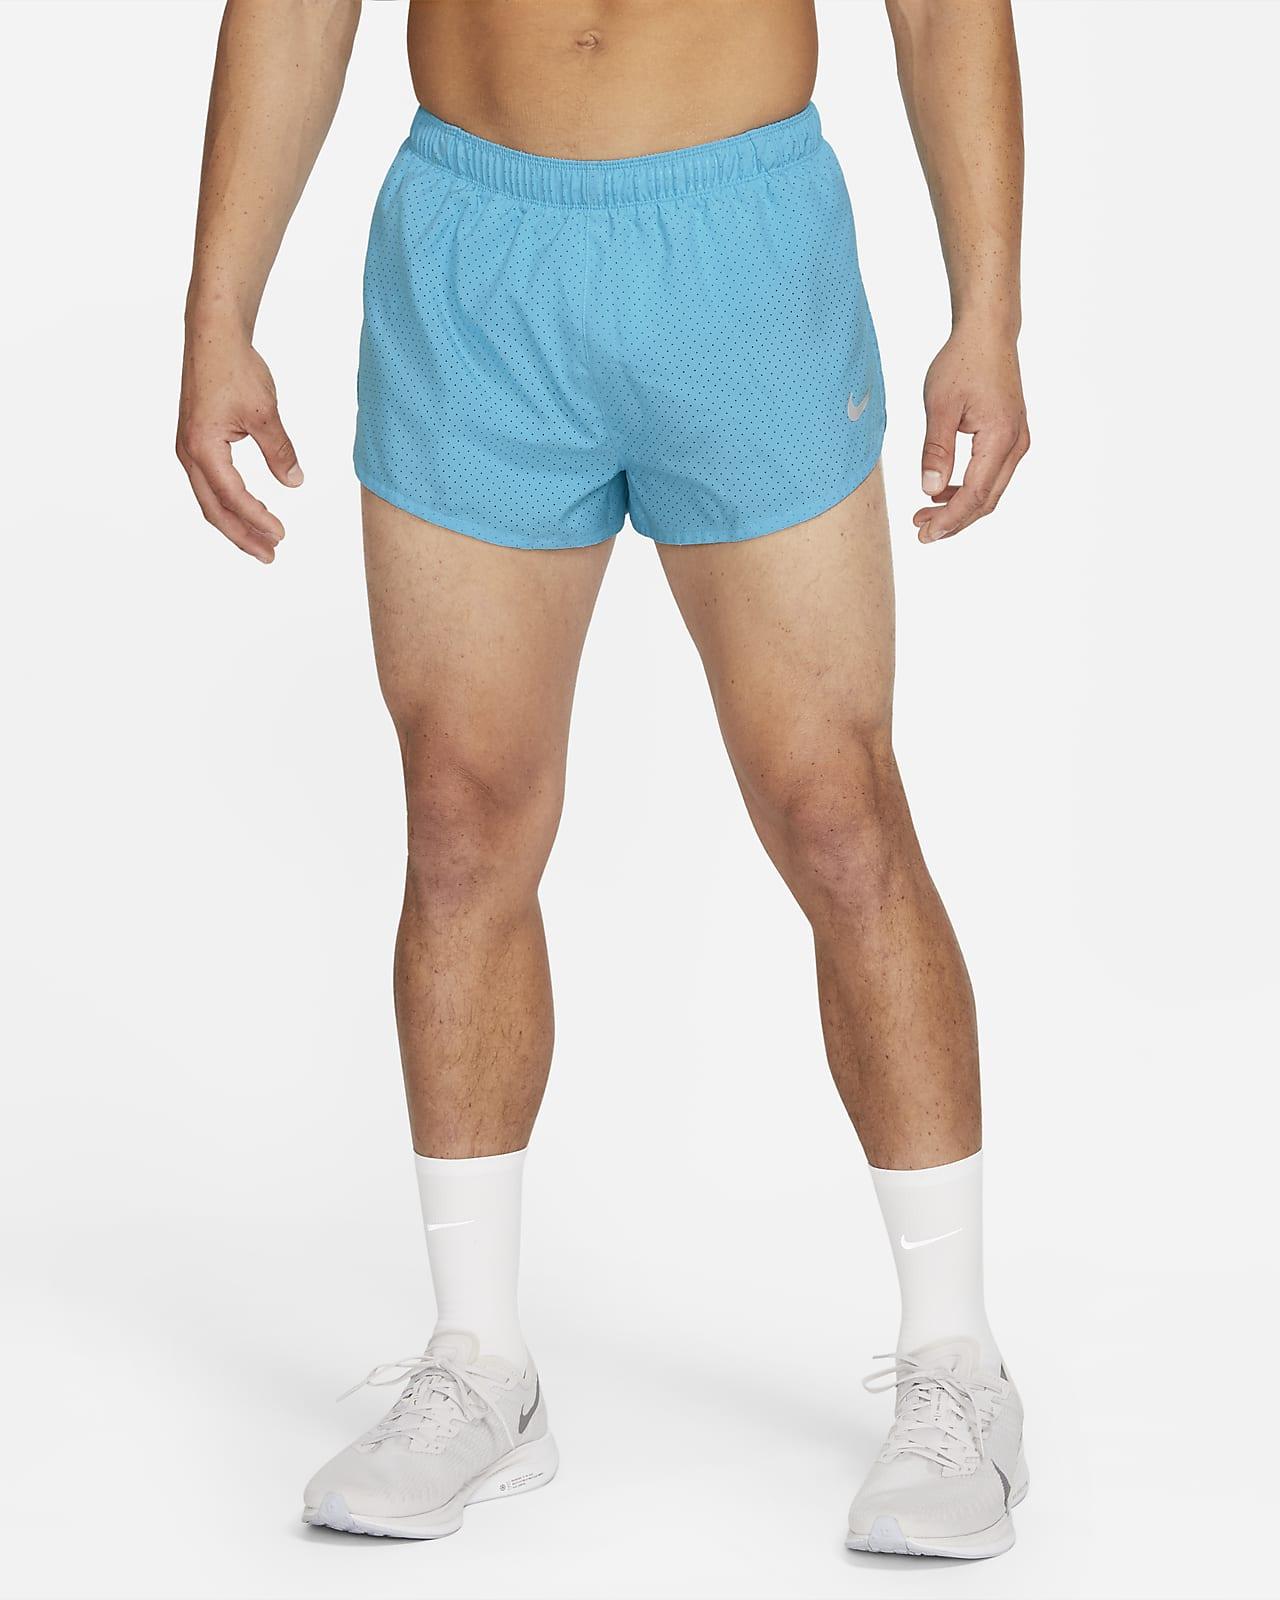 Nike Fast Men's 5cm (approx.) Running Shorts